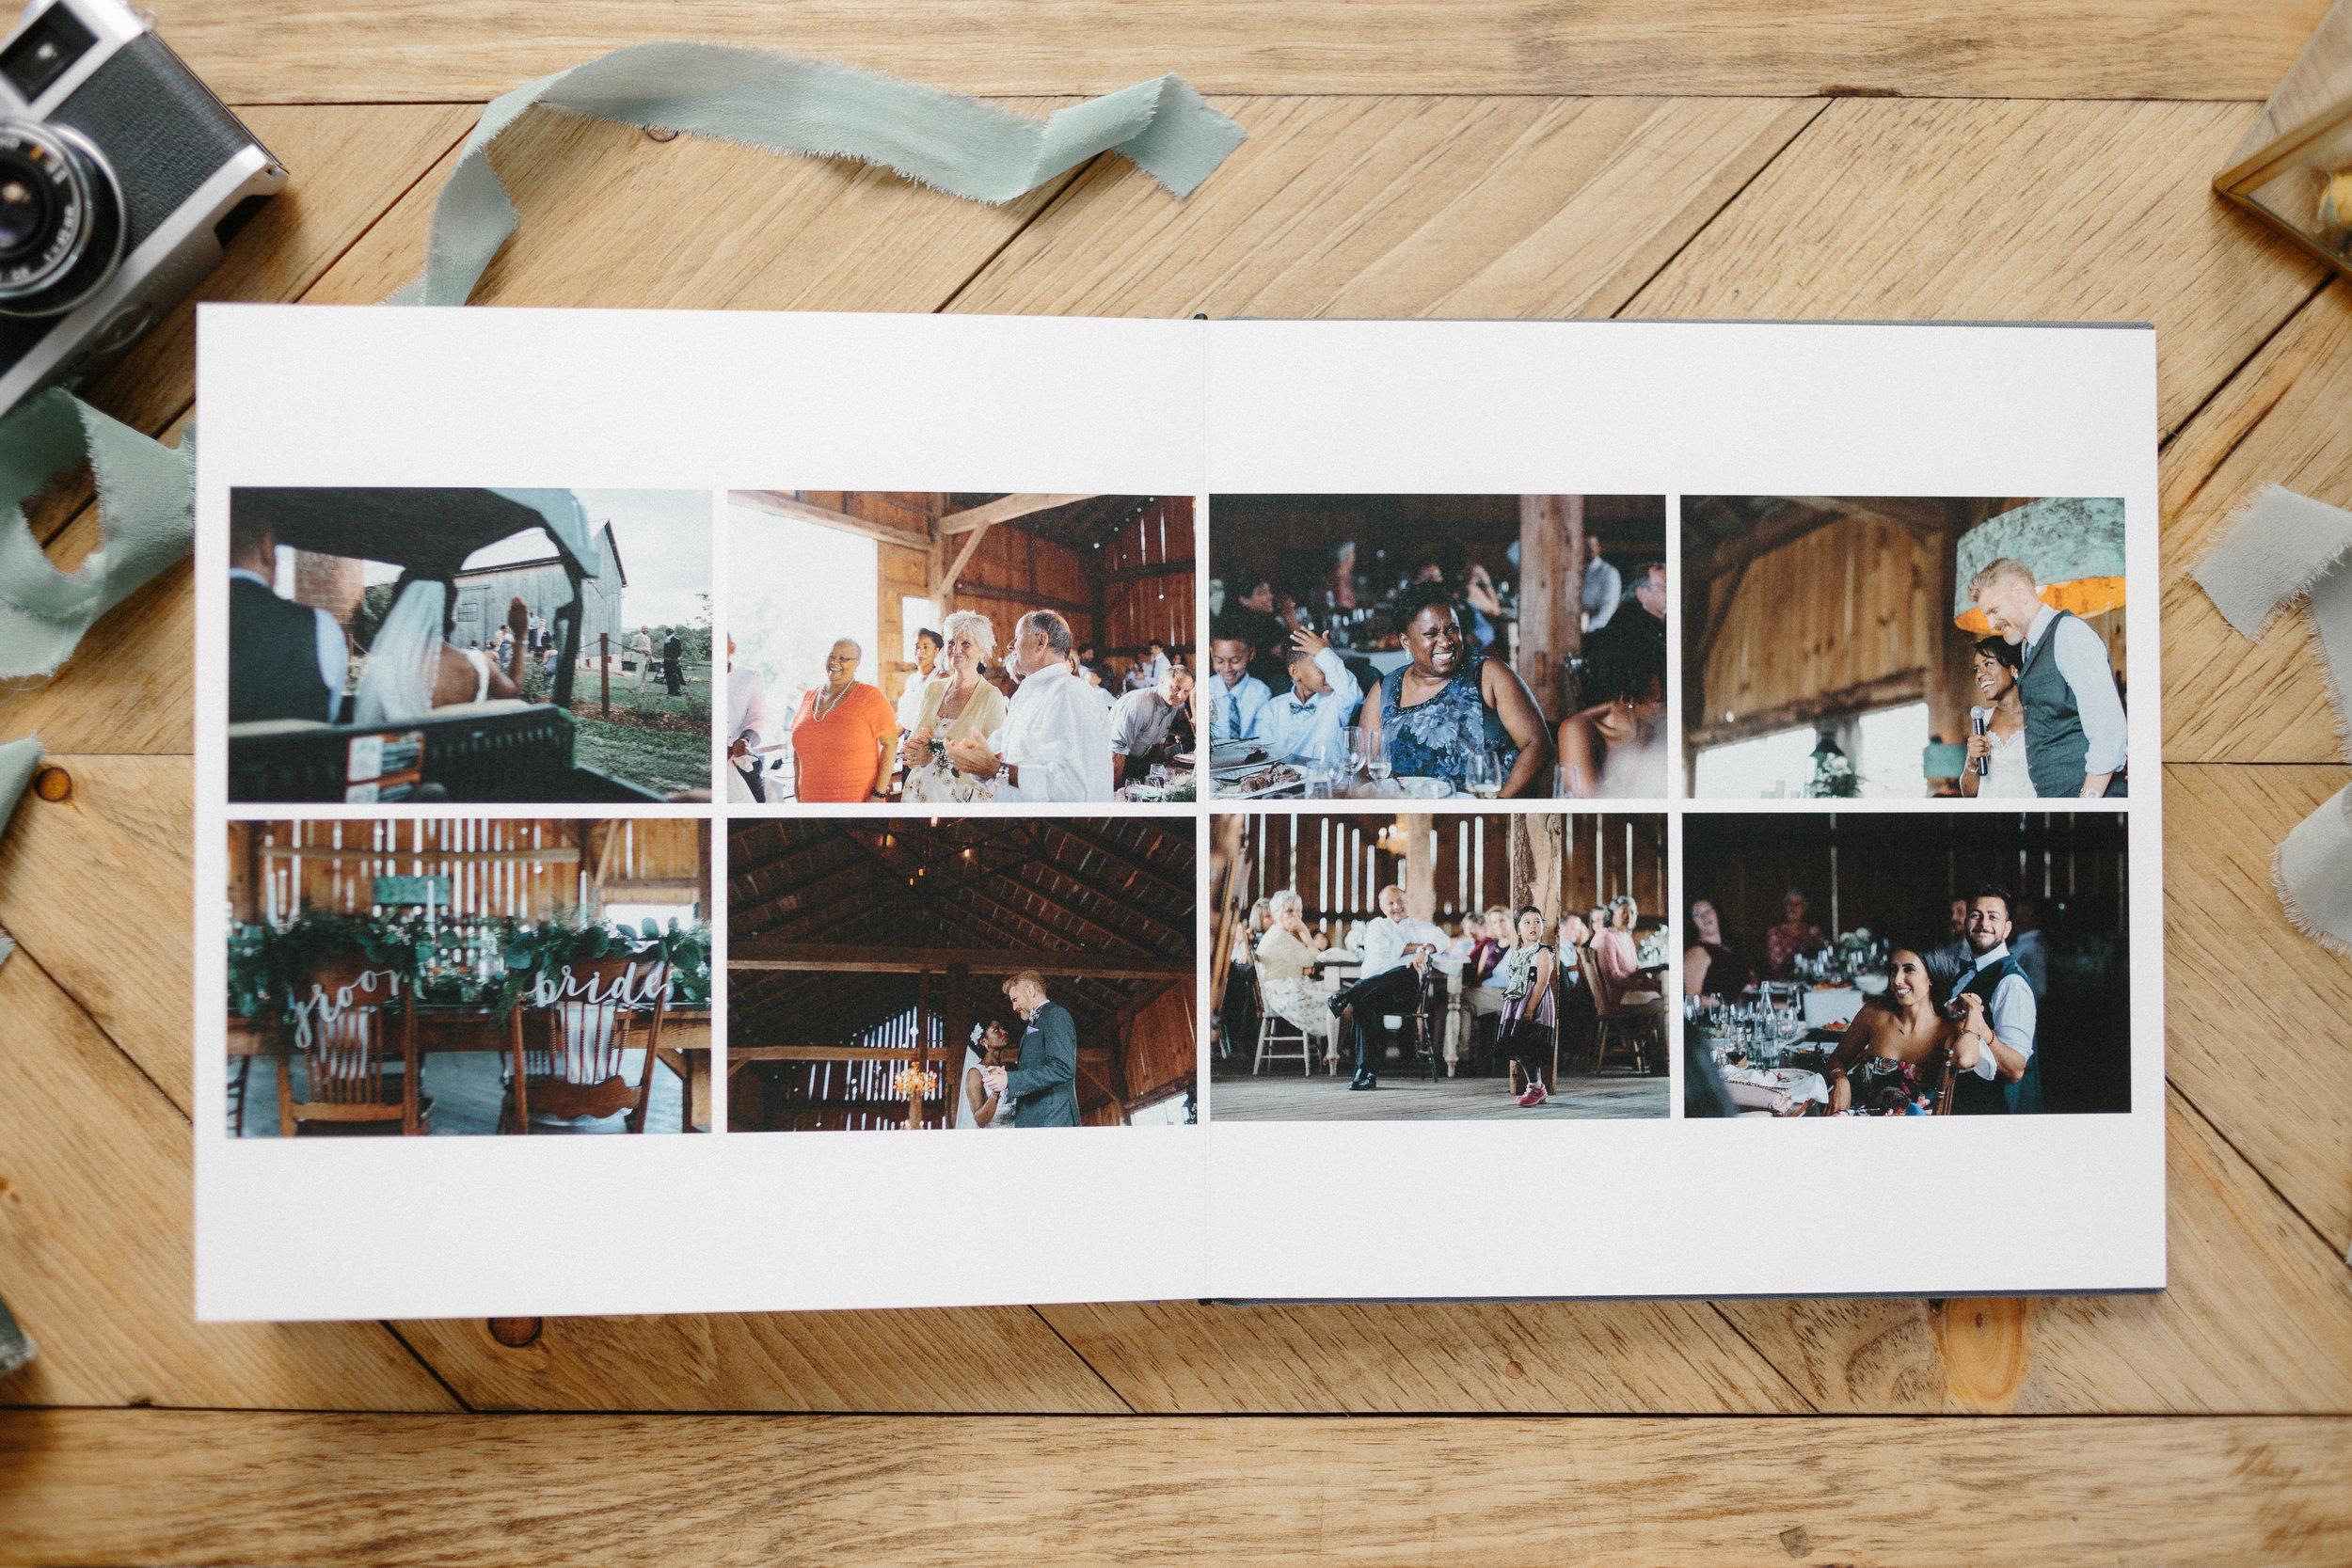 ryanne-hollies-photography-wedding-album-design-details-tono-and-co-artifact-uprising-72.jpg